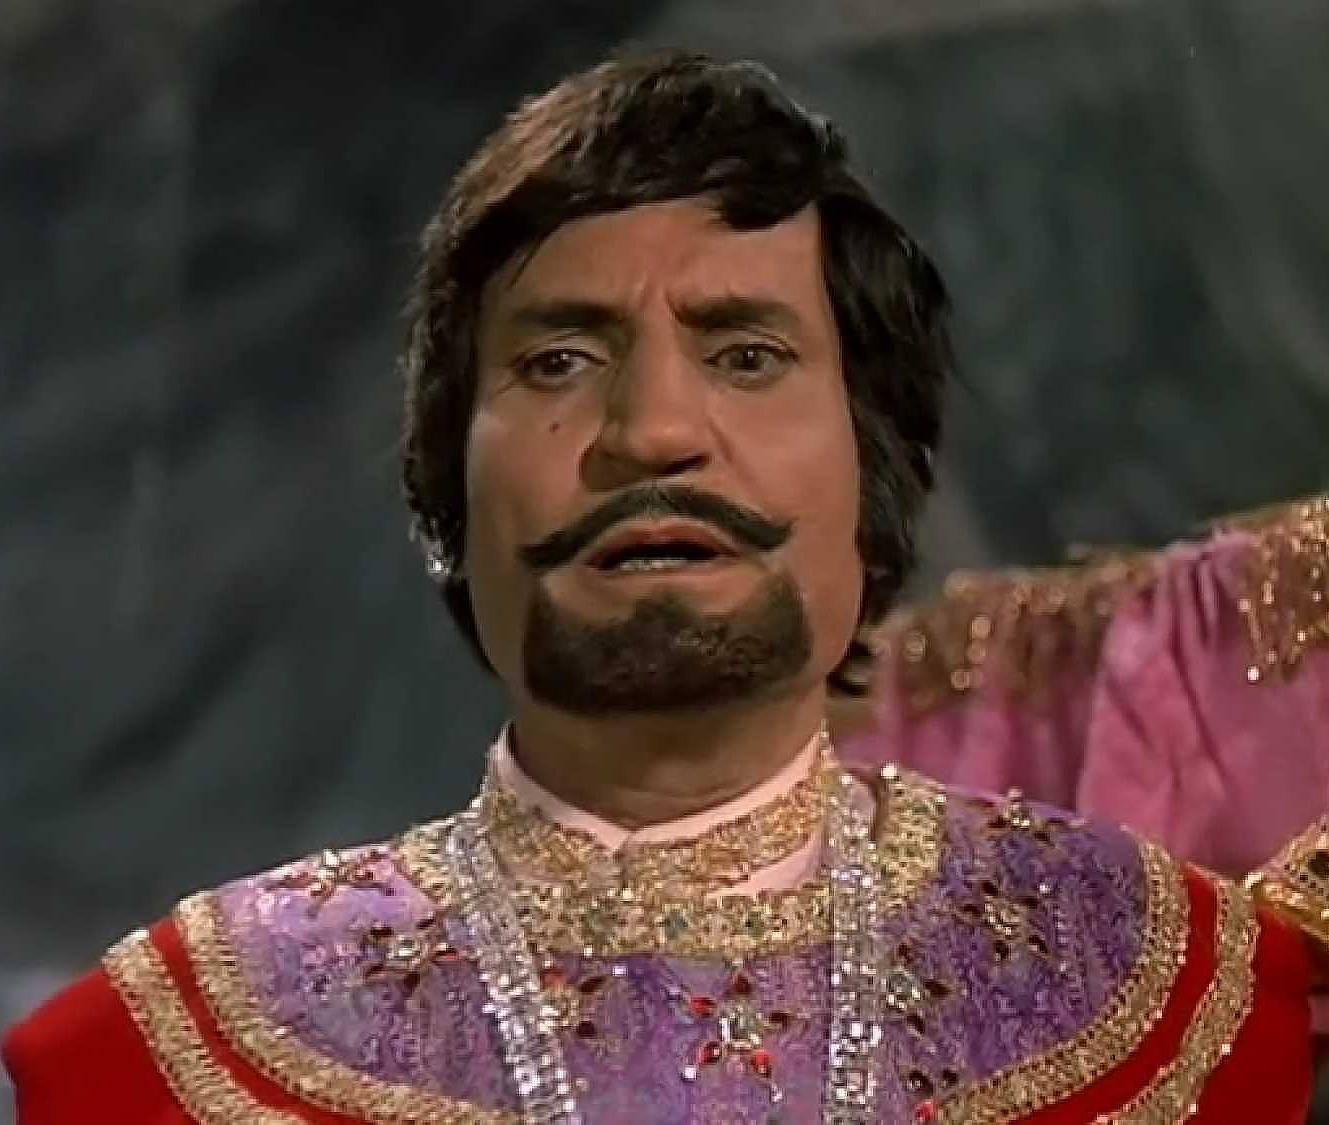 #GoldenFrames: Jeevan, the incredible 'Narad Muni' of Bollywood!